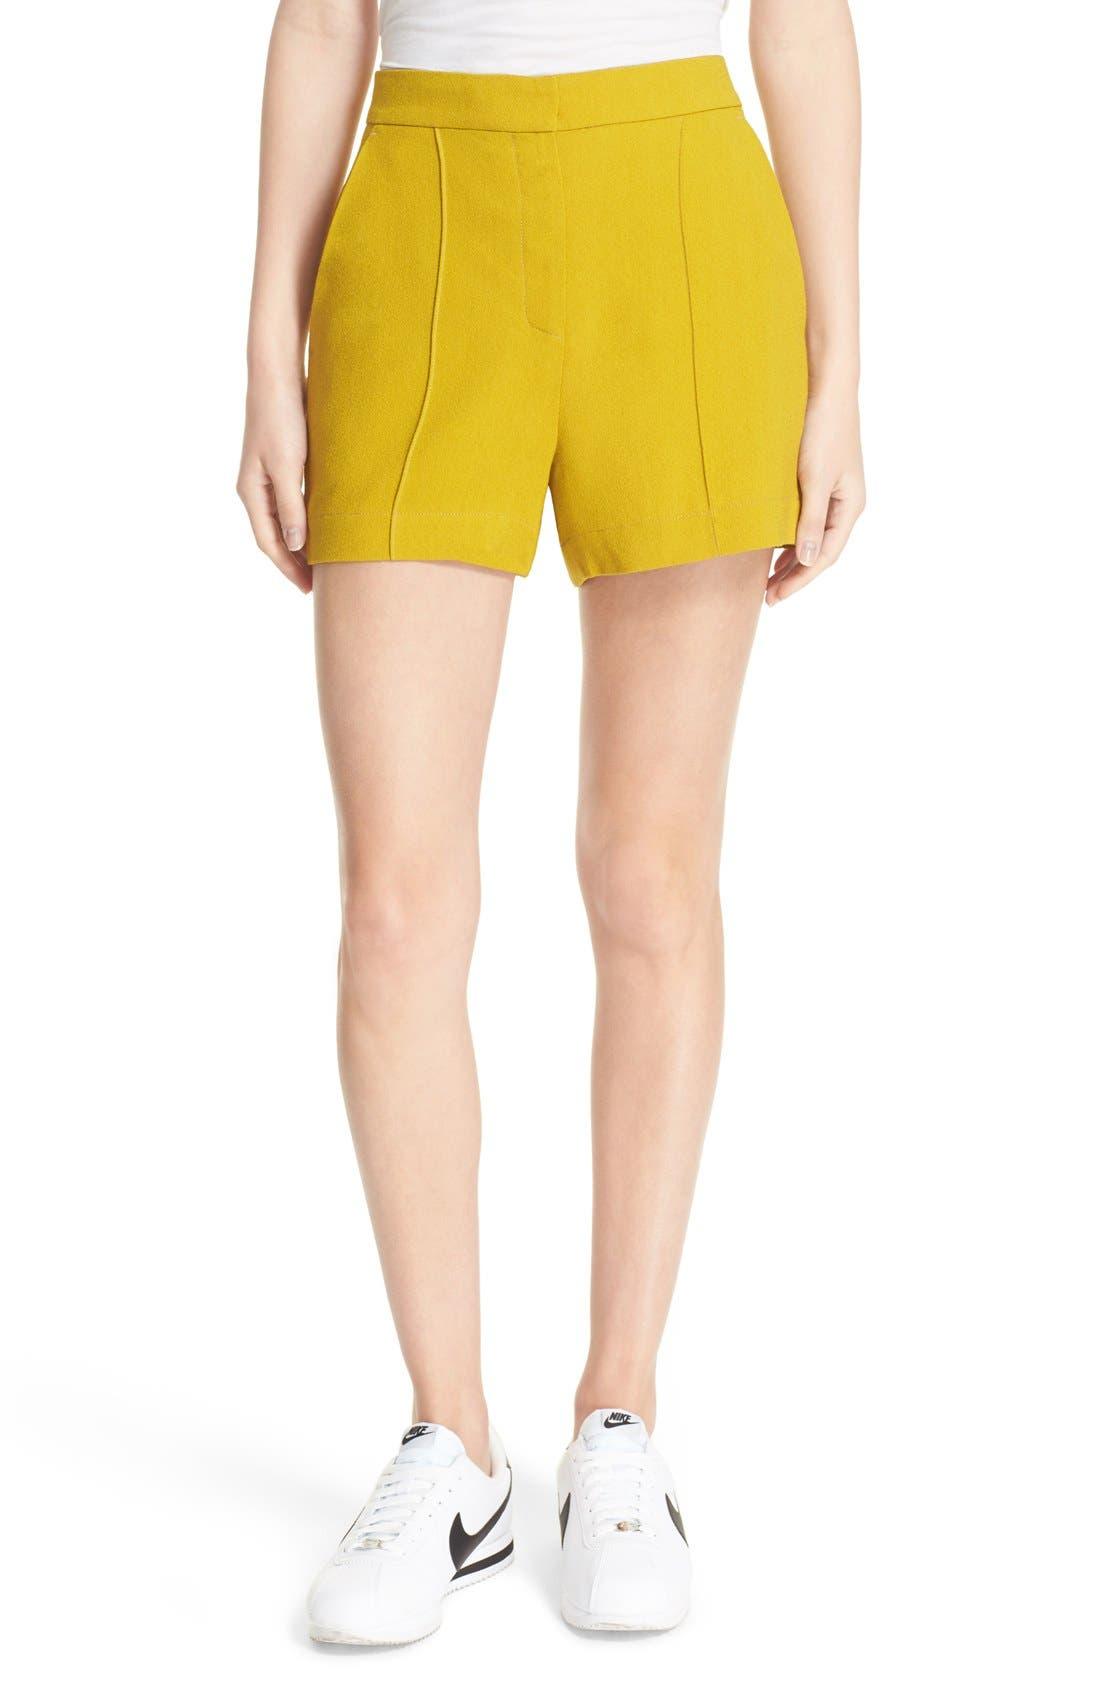 A.L.C. Cohen High Waist Shorts